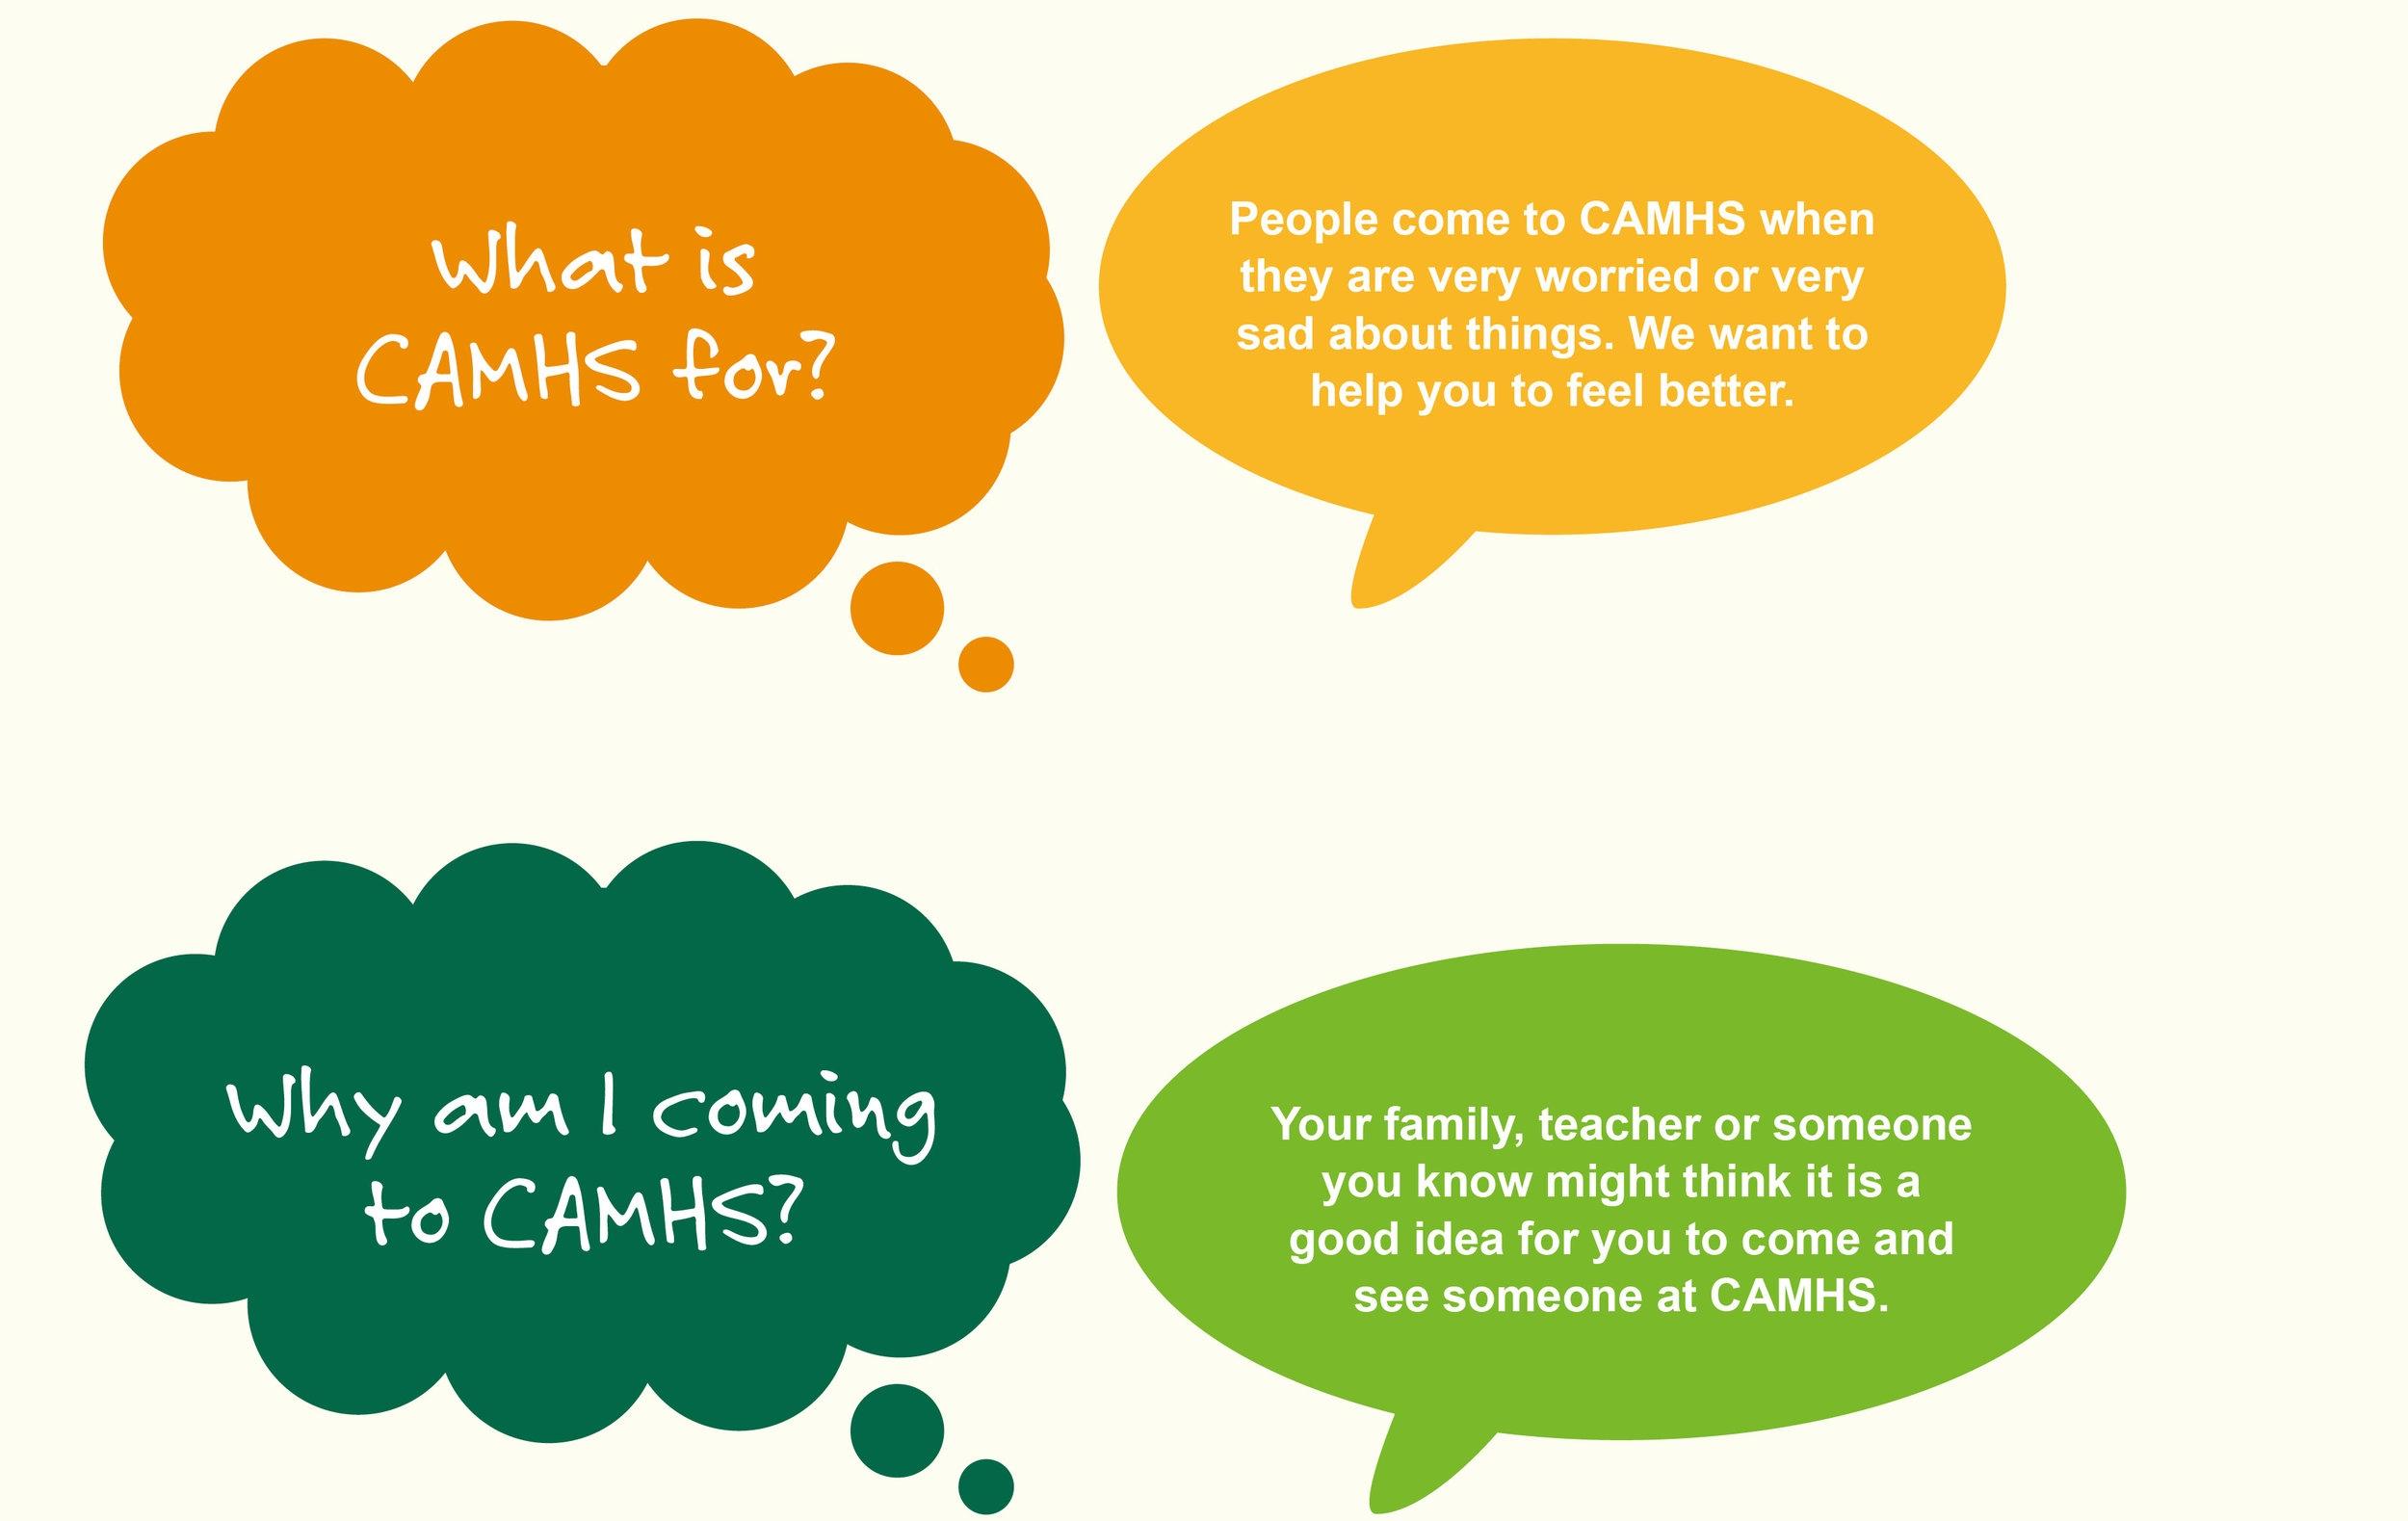 CAMHS_diagrams_6.jpg